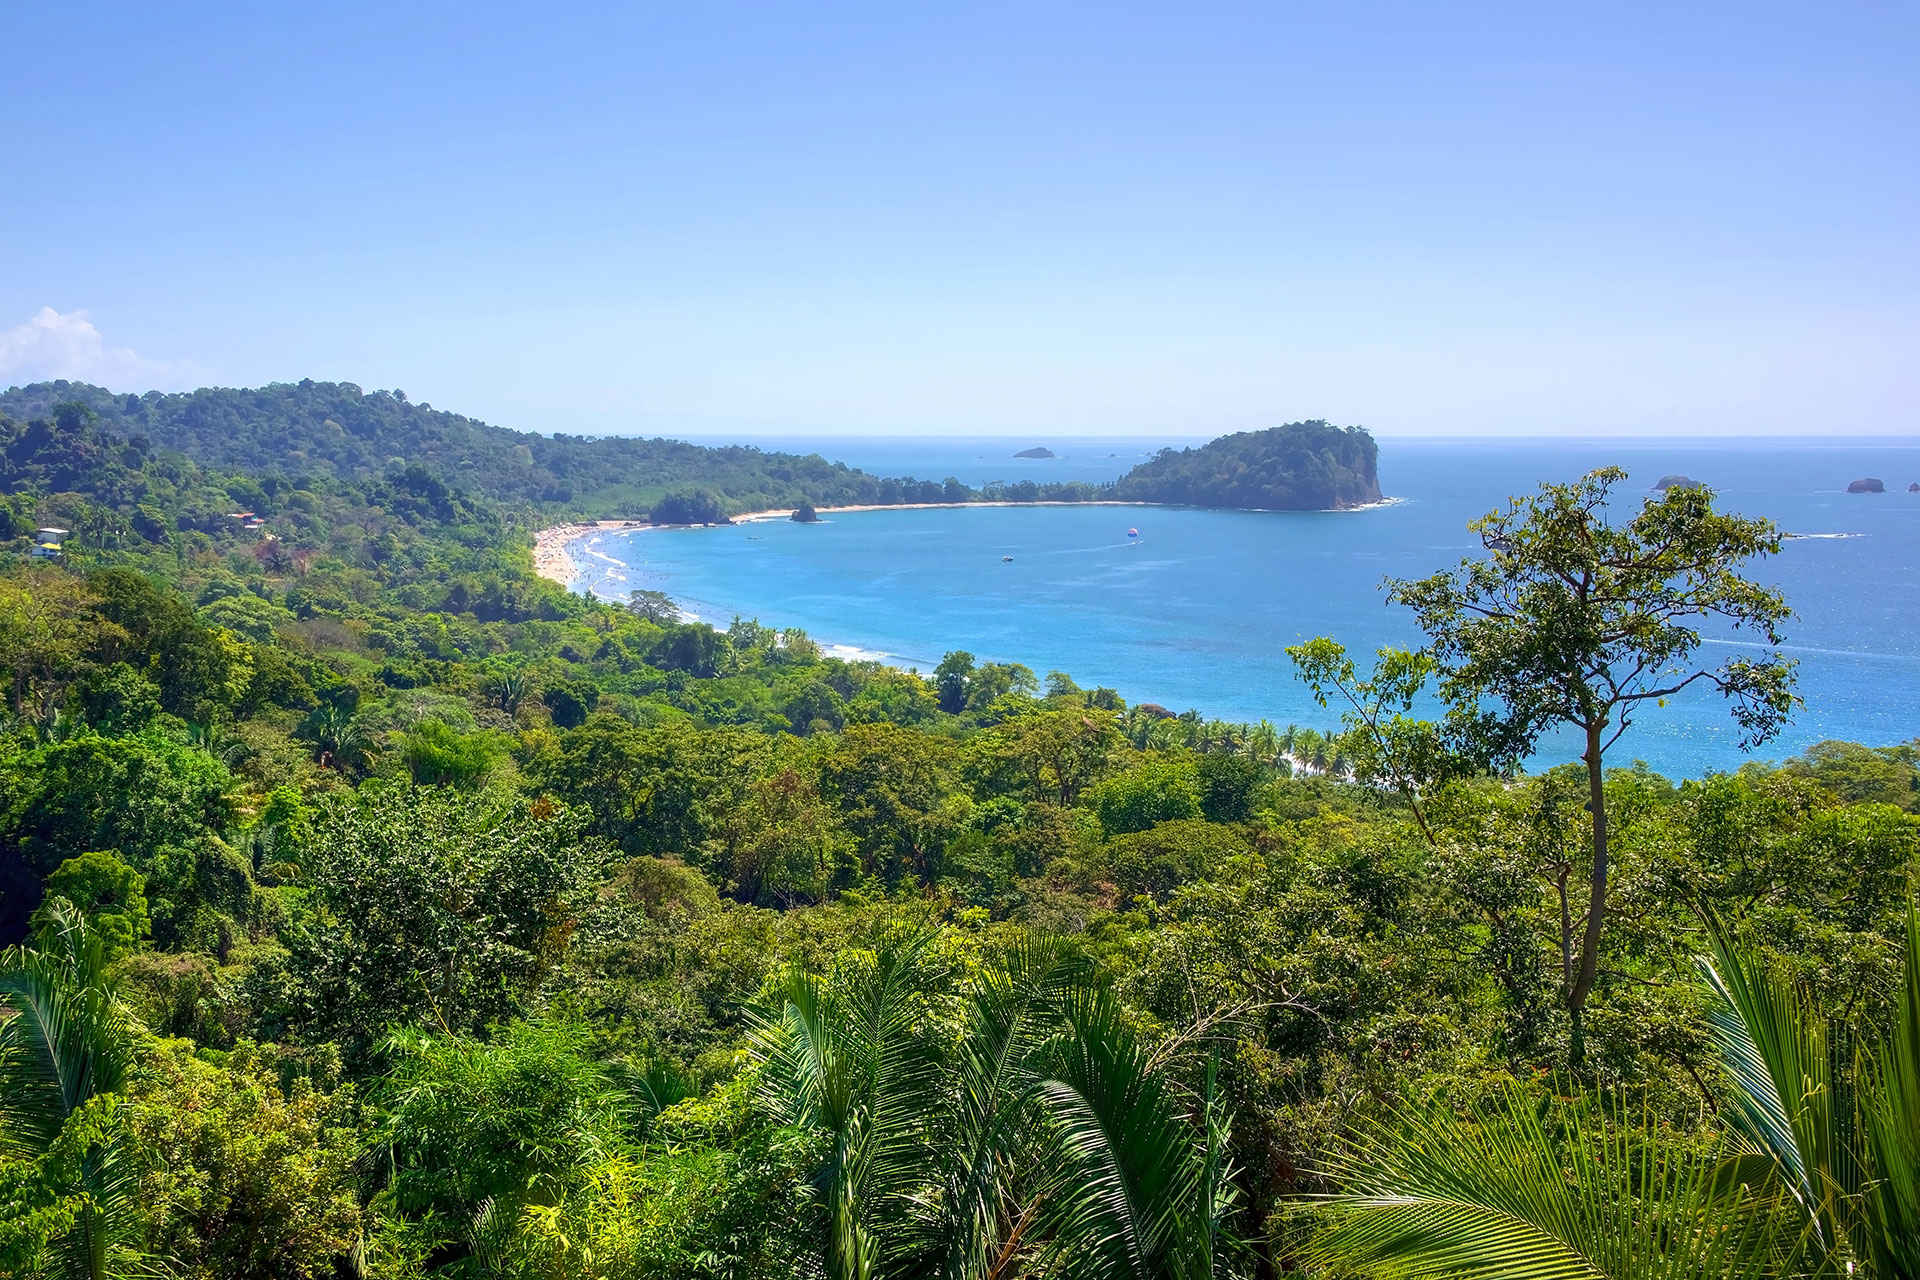 aerial view of Costa Rica; Courtesy of PAUL ATKINSON/Shutterstock.com